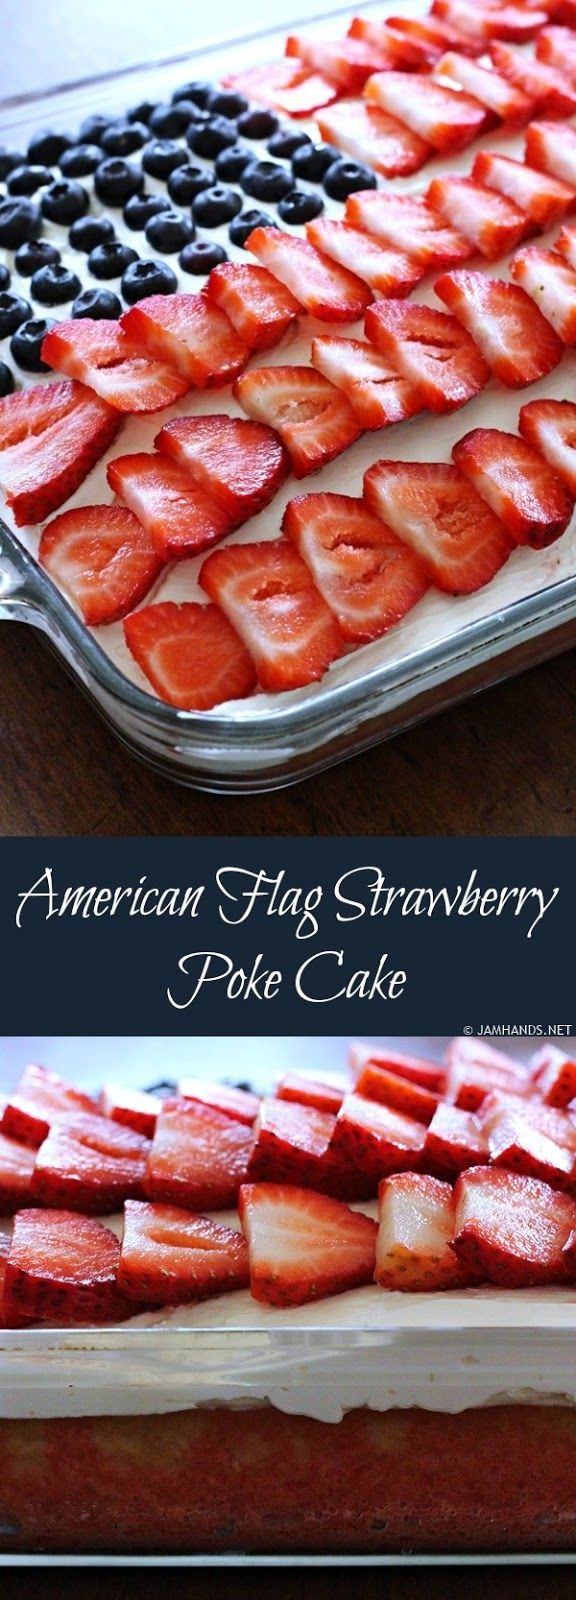 Jam Hands: American Flag Strawberry Poke Cake